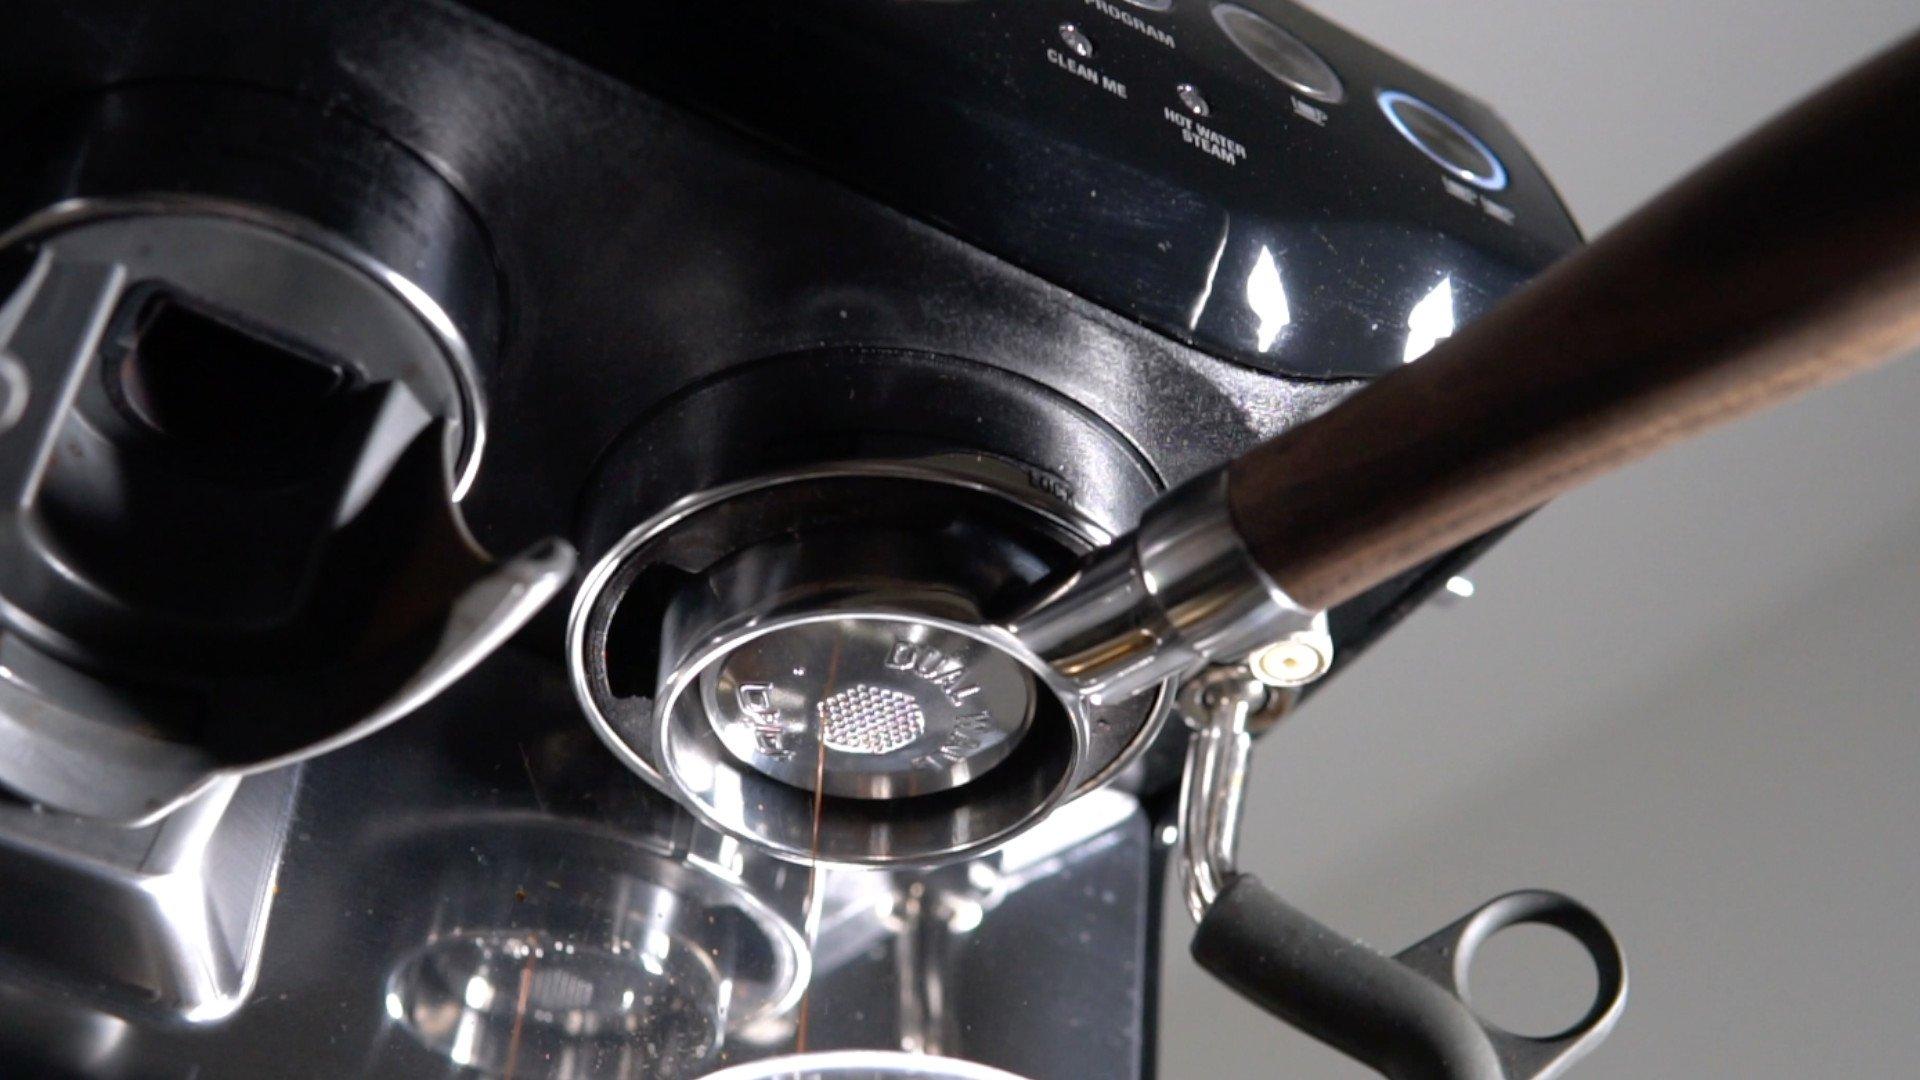 Pressurized Espresso Basket